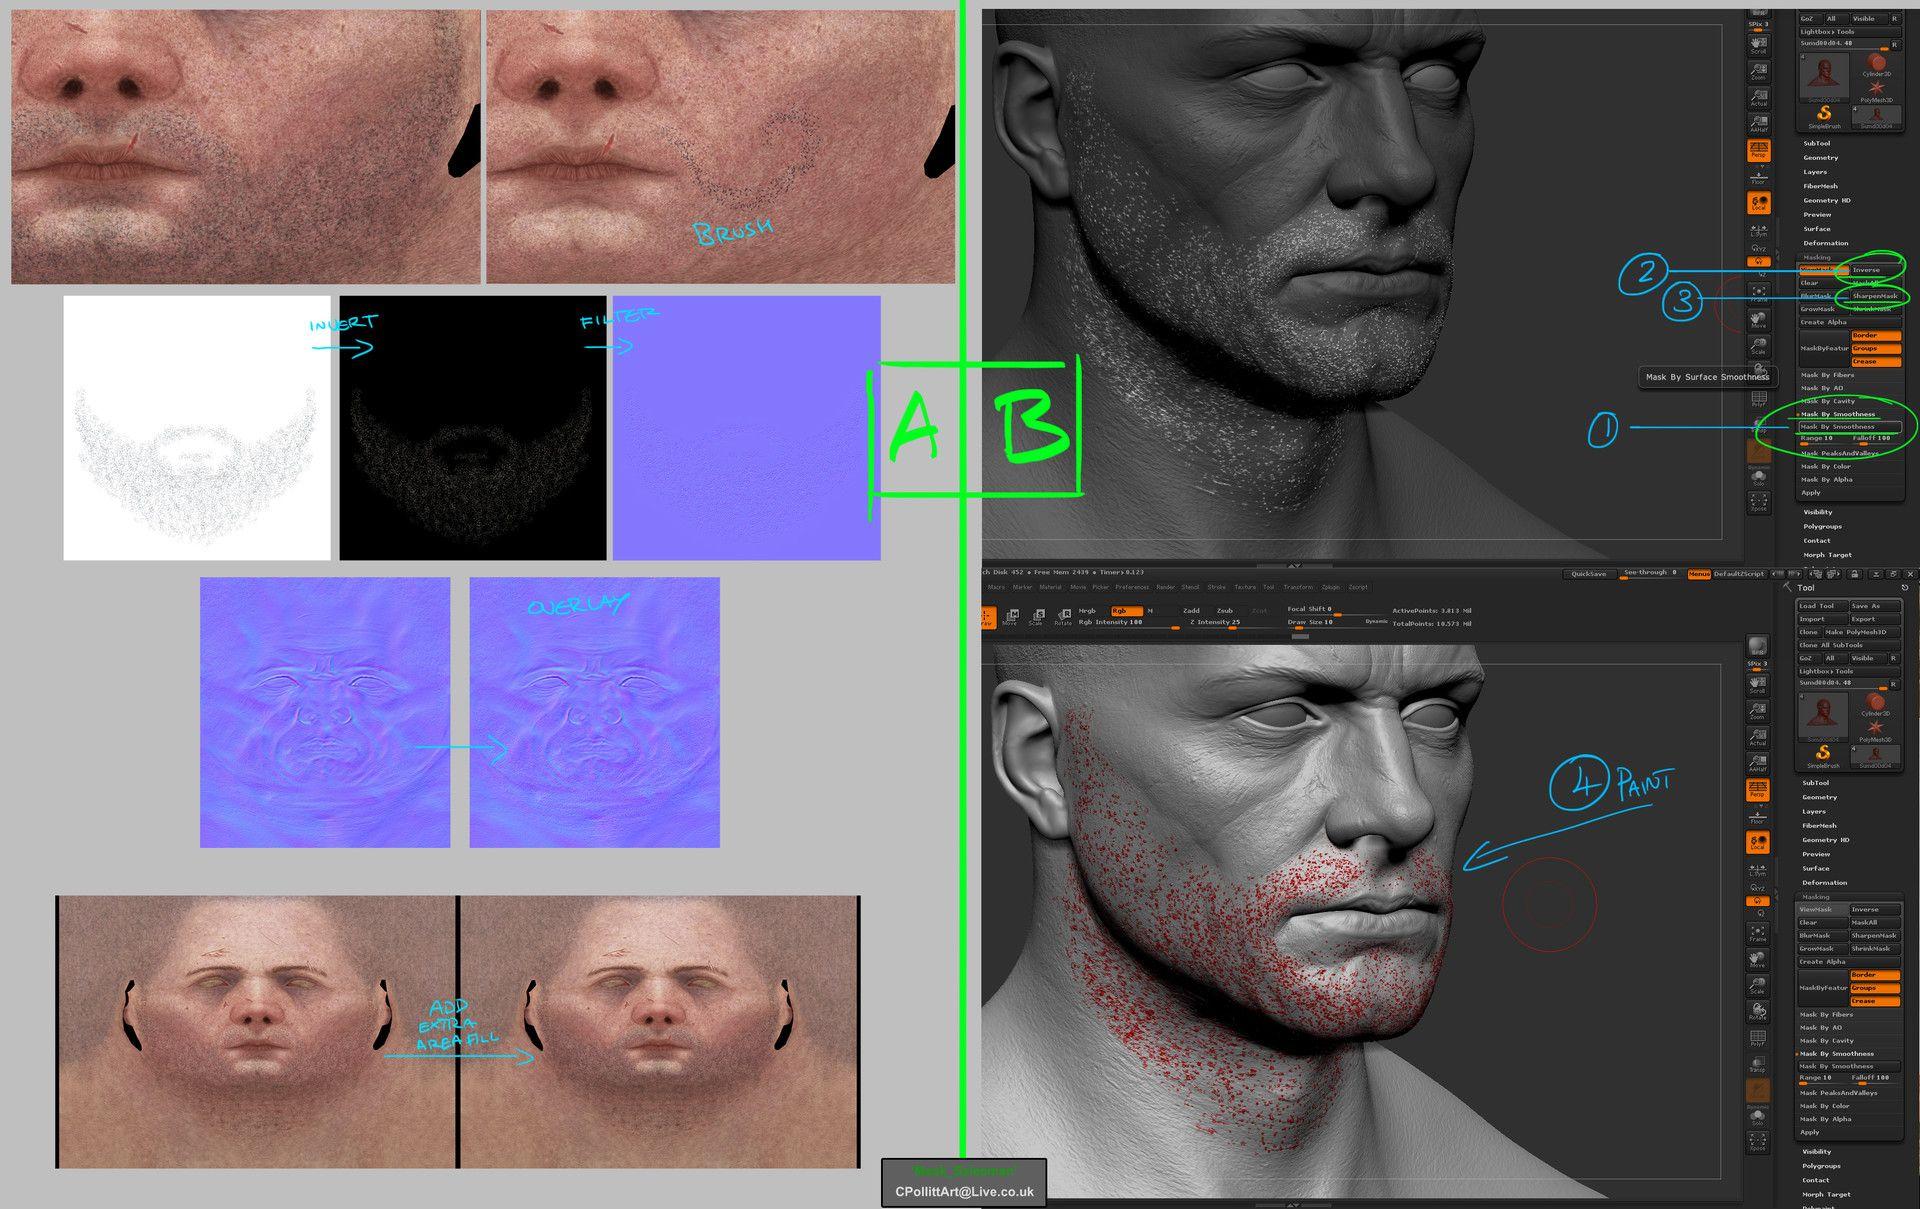 ArtStation - (Tutorial) Skin Texturing, Skin Pore Creases